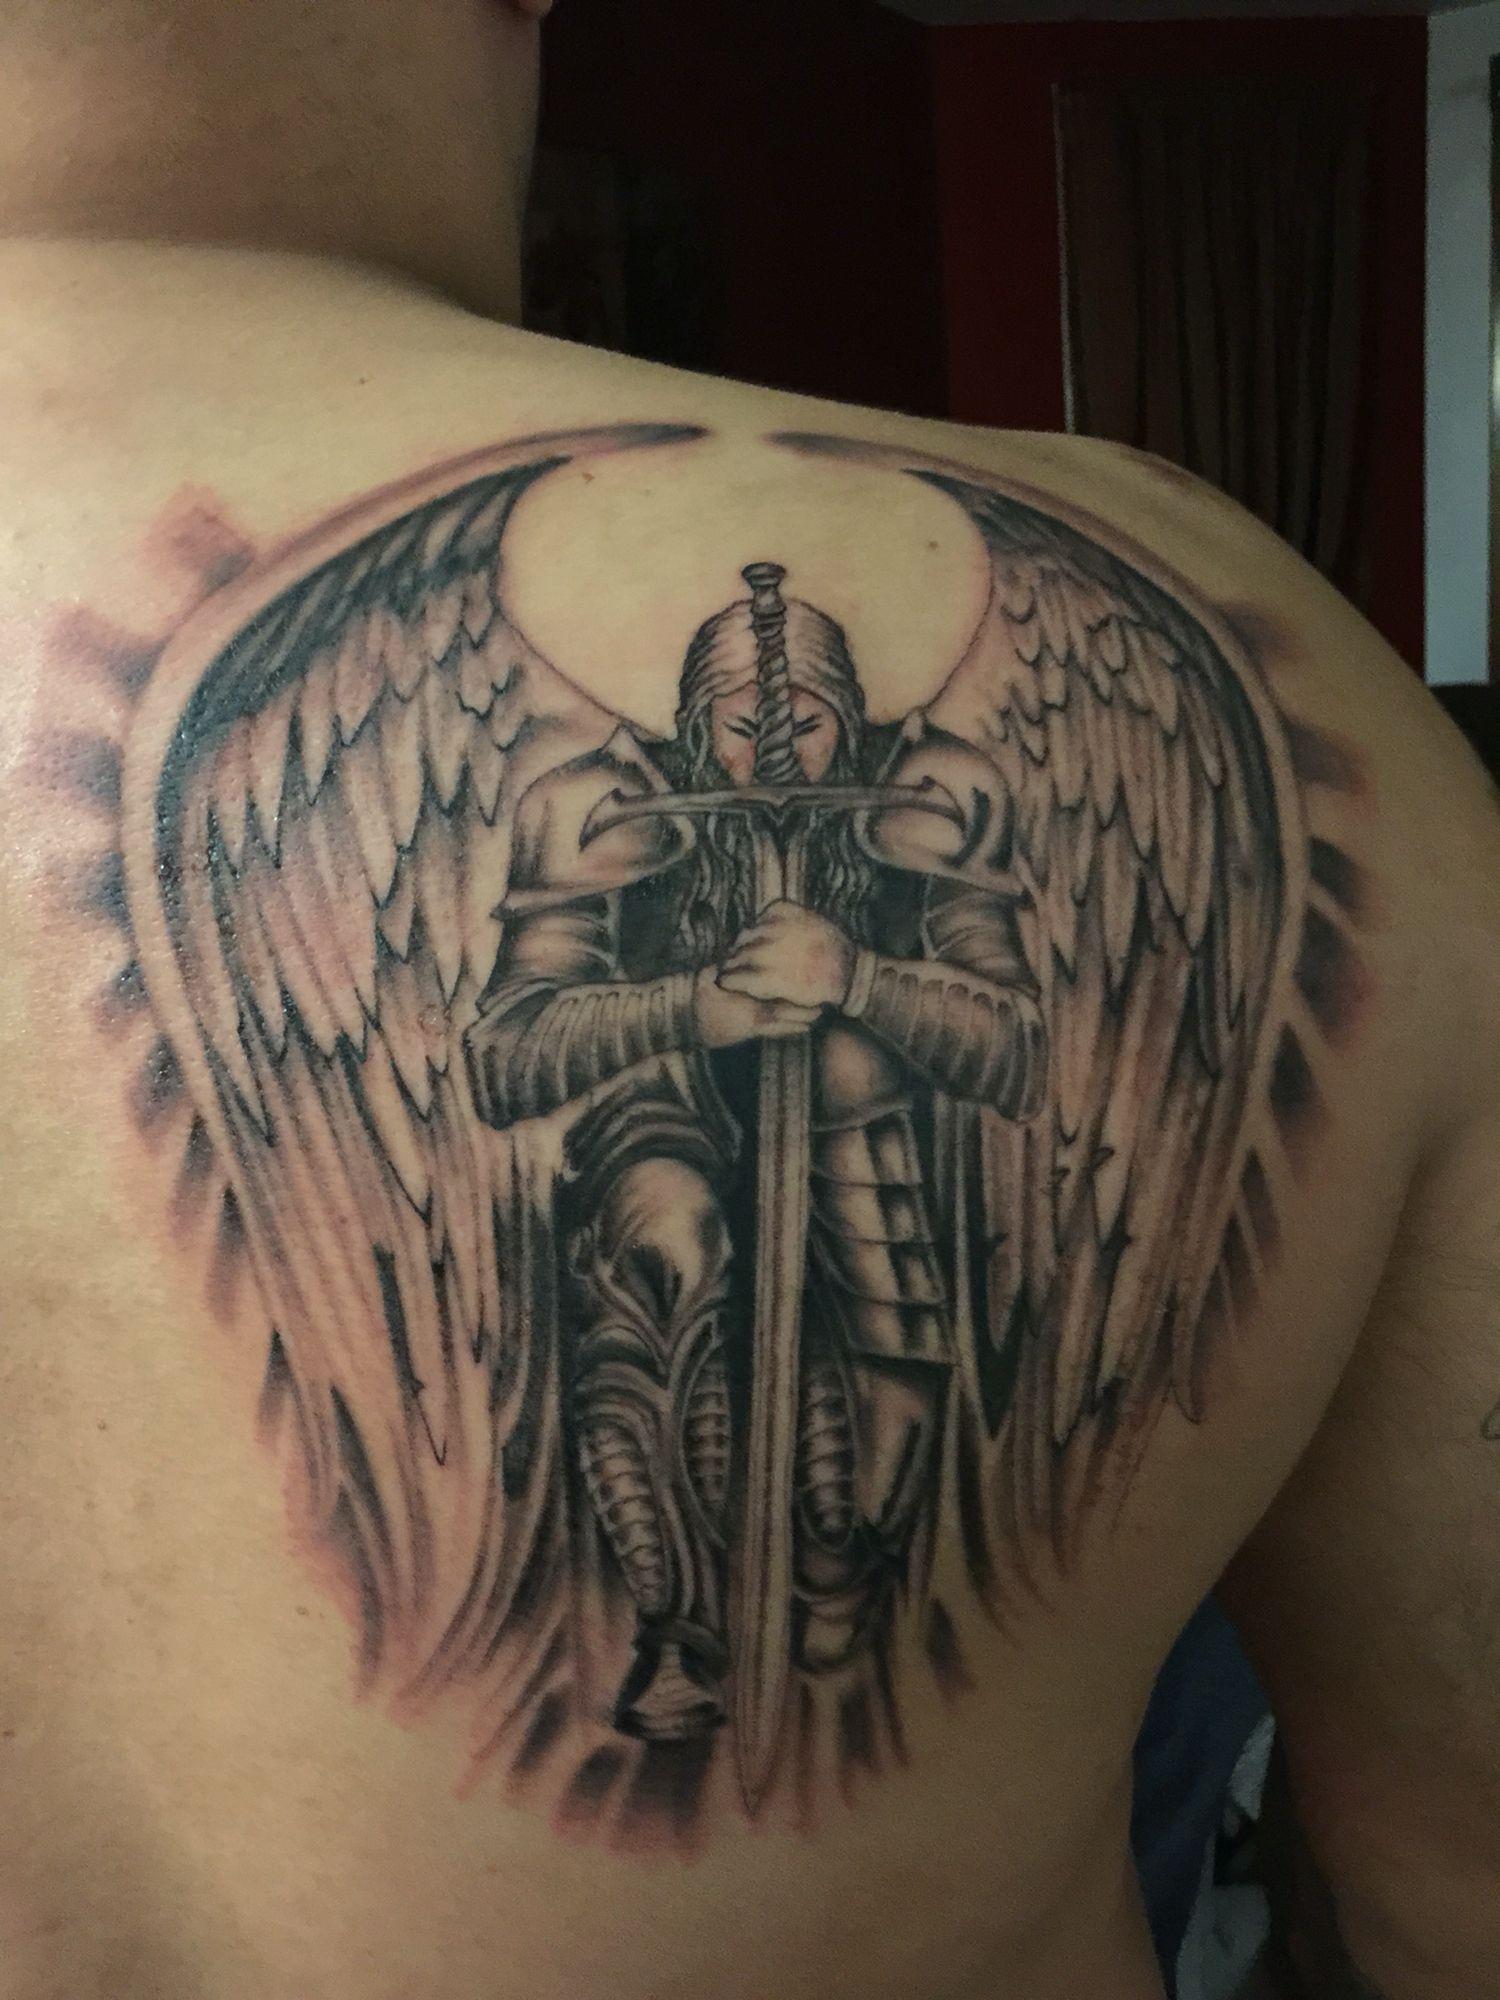 Male Guardian Angel Back Neck Tattoo Http Viraltattoo Net Male Guardian Angel Back Neck Tattoo Ht In 2020 Guardian Angel Tattoo Angel Tattoo Men Angel Tattoo Designs